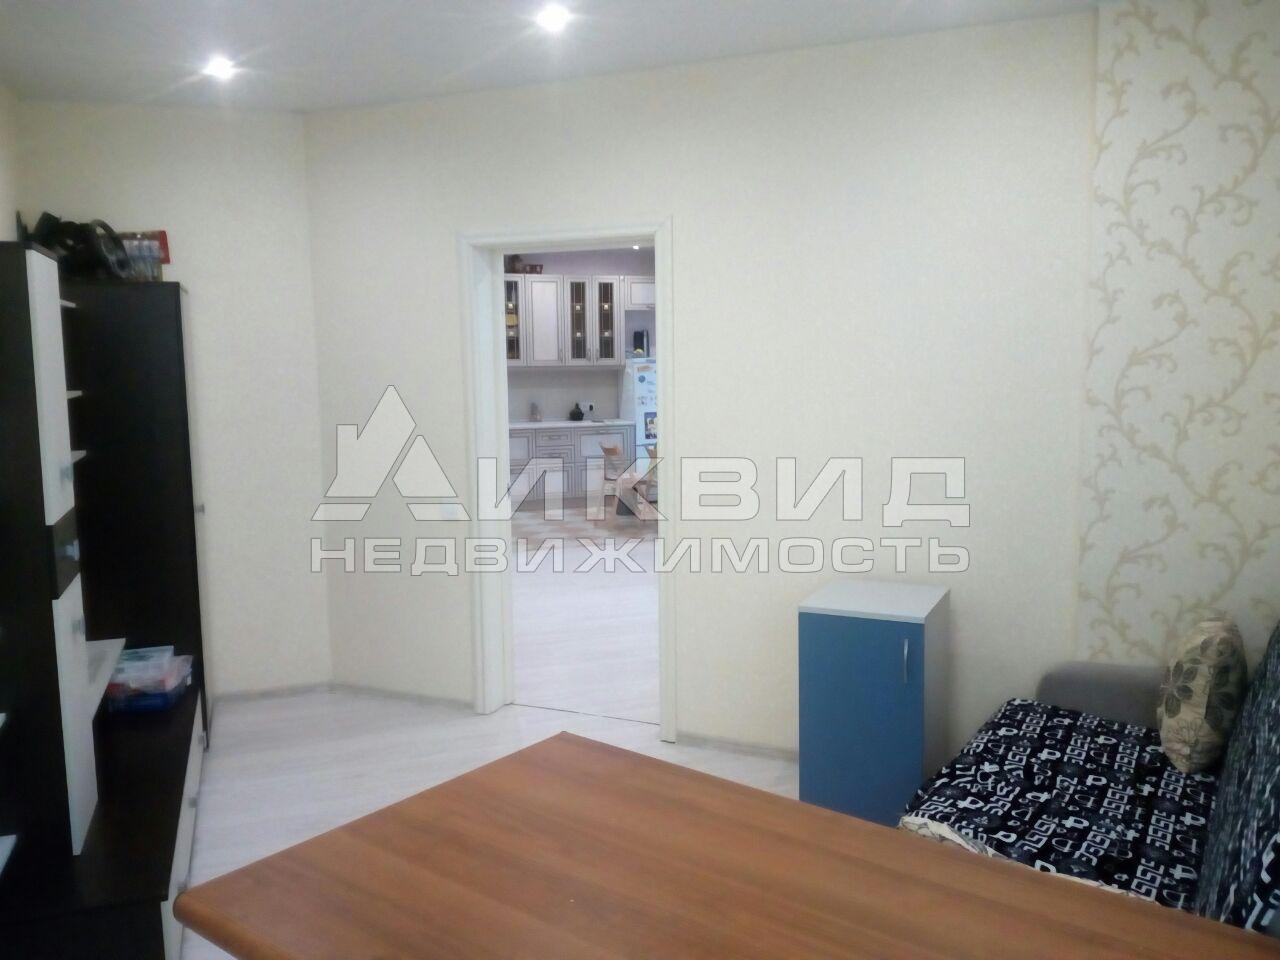 Квартира, 2 комнаты, 69 м² в Химках